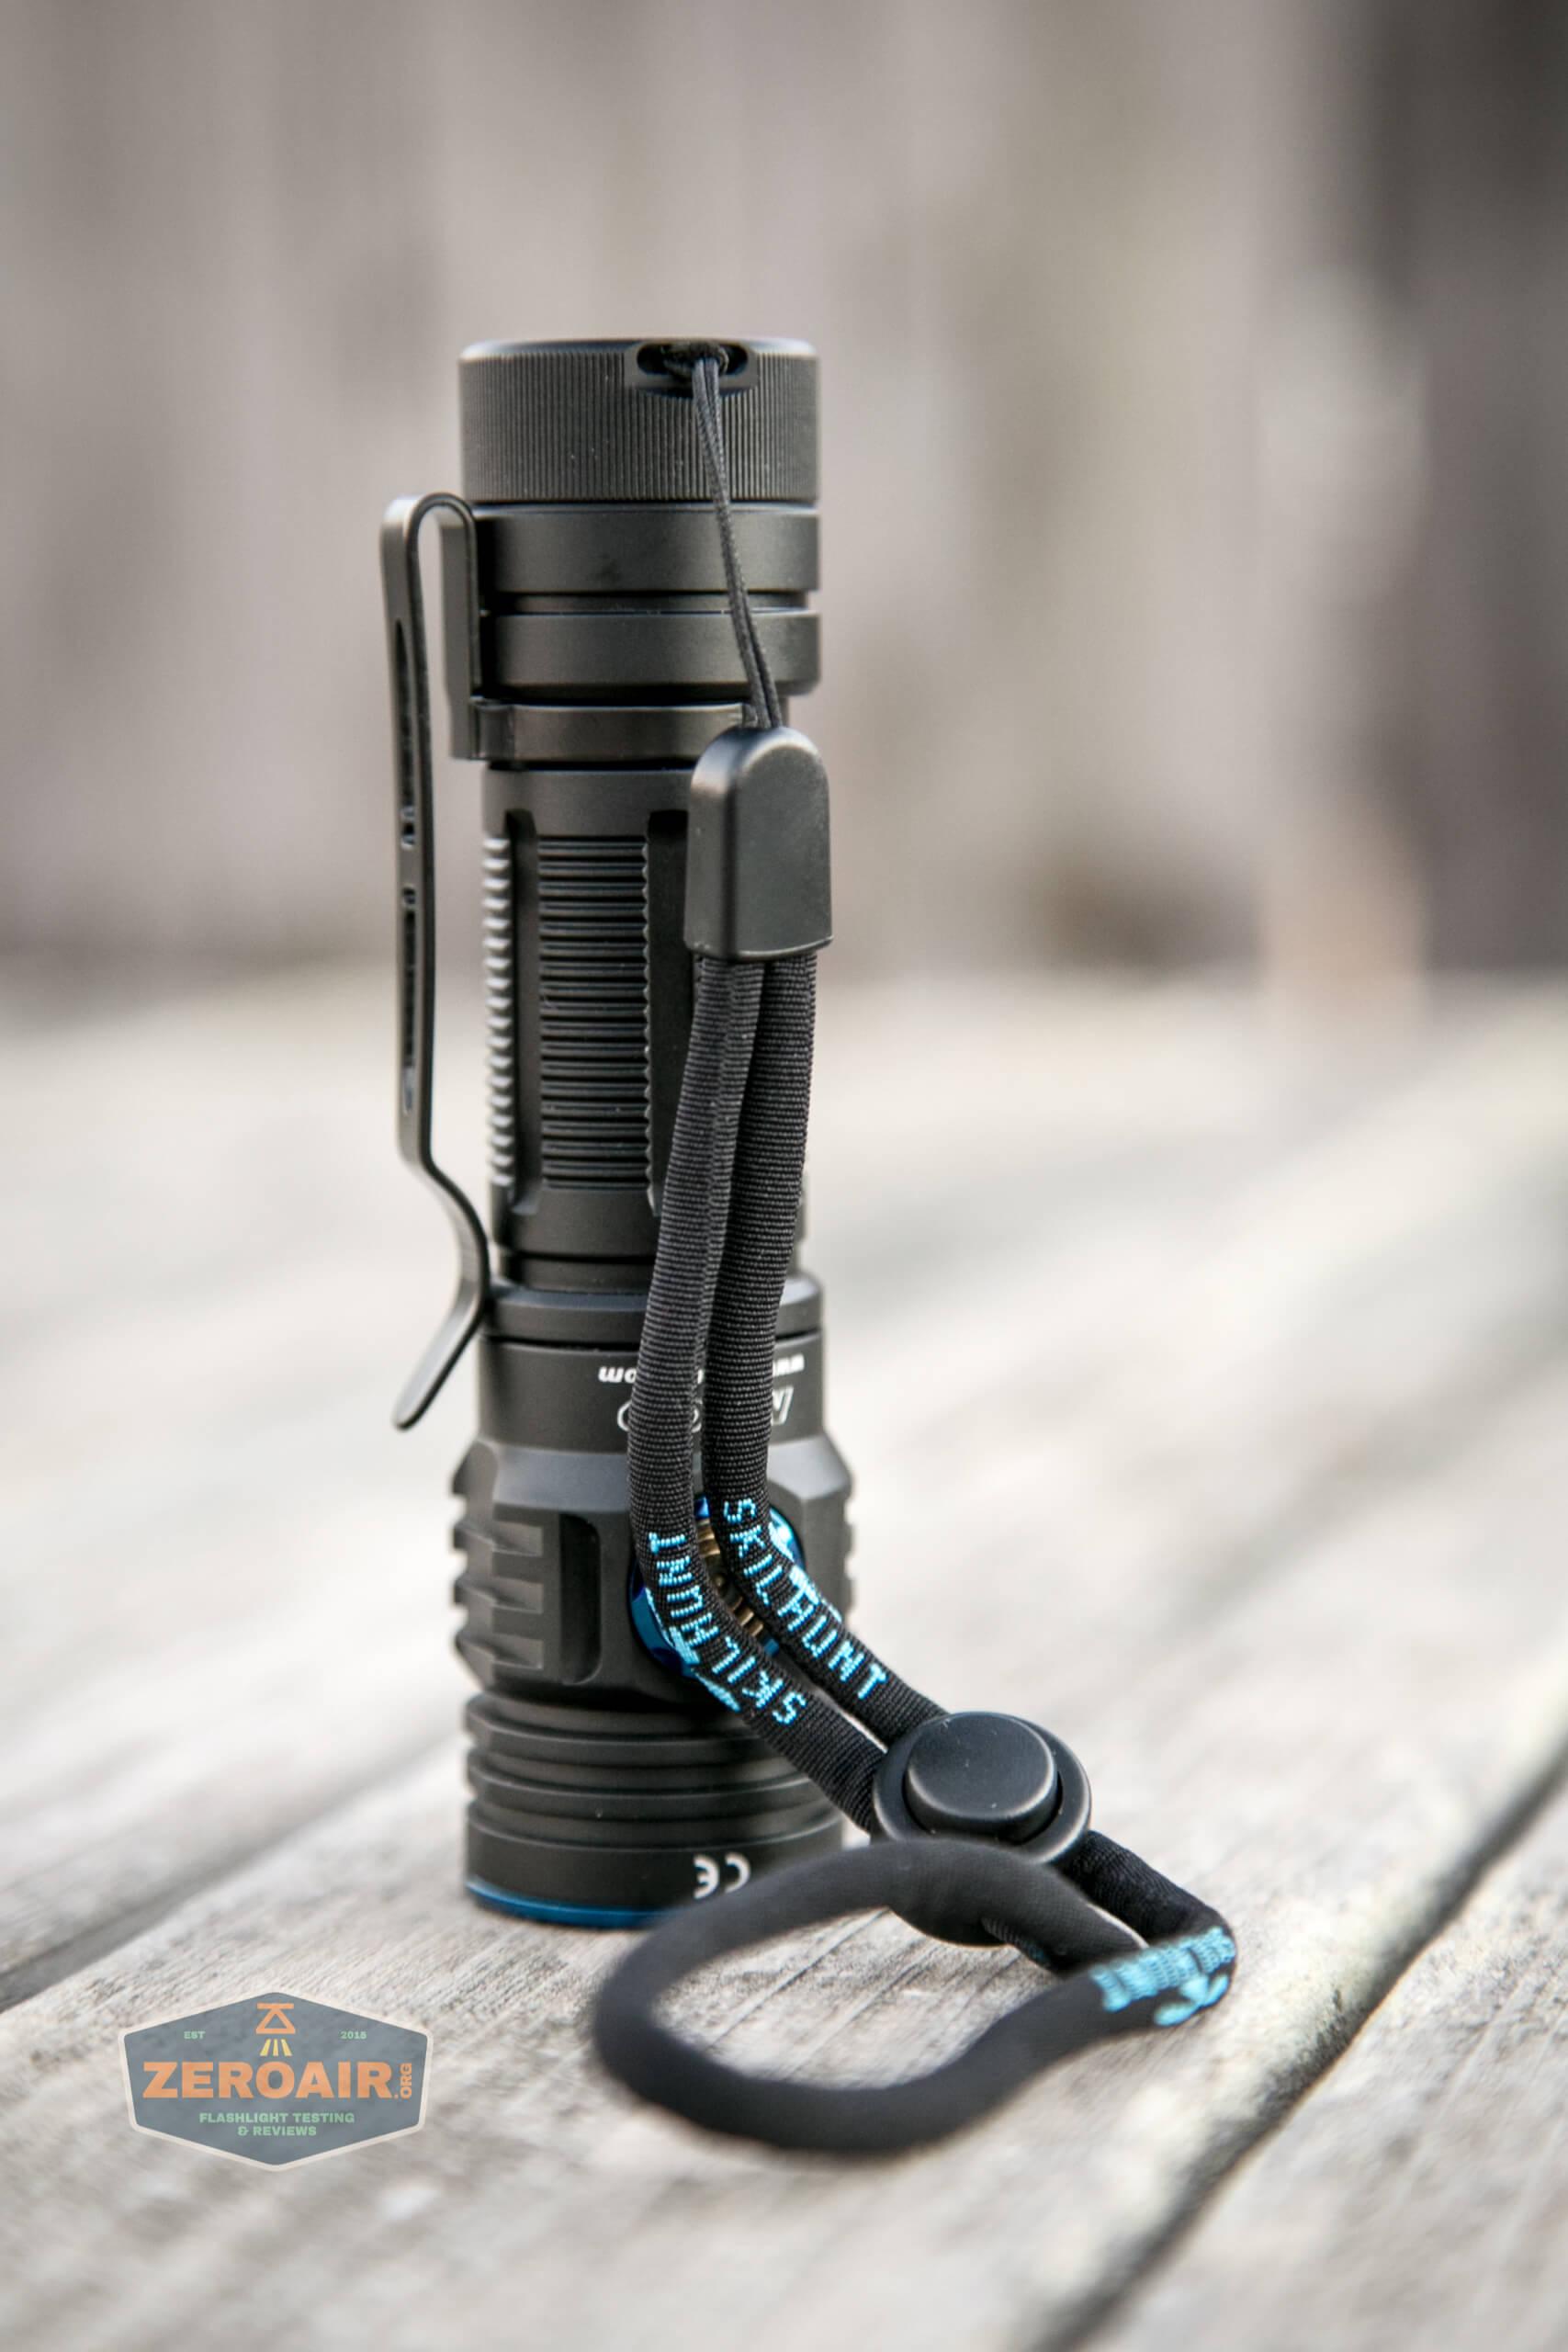 skilhunt m300 18650 flashlight lanyard installed